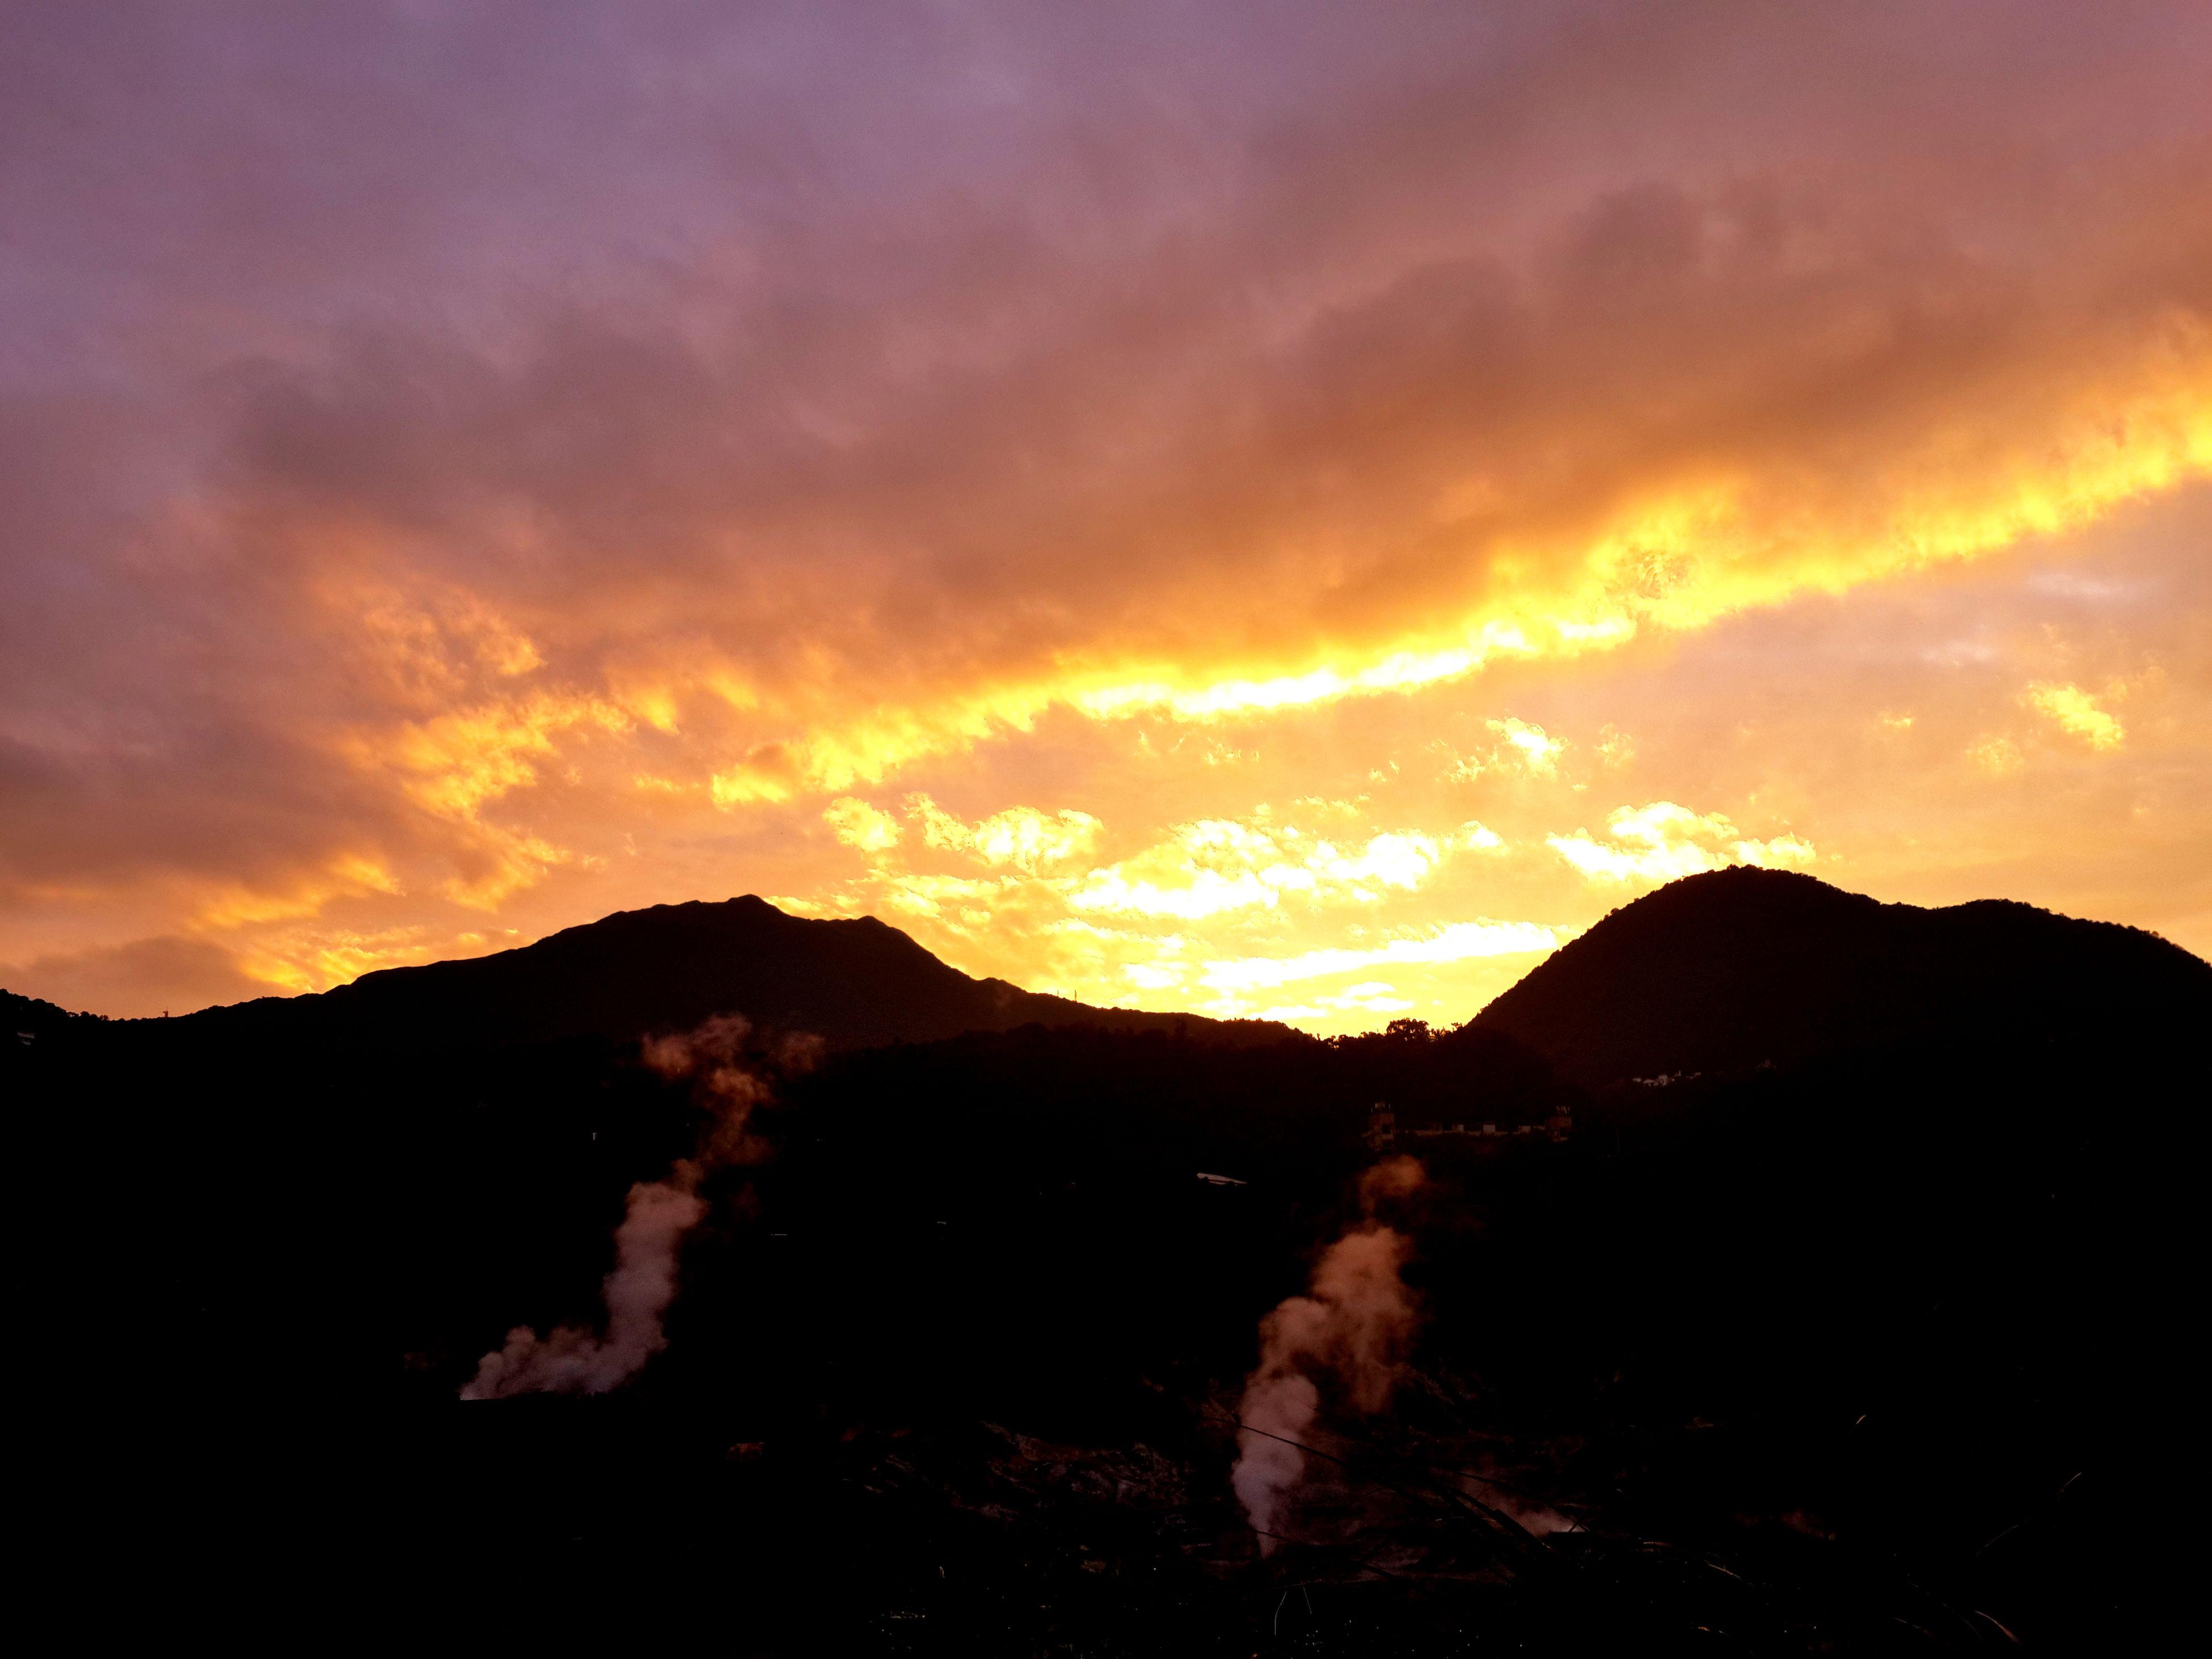 sunset, mountain, scenics, sky, mountain range, tranquil scene, beauty in nature, tranquility, orange color, cloud - sky, idyllic, nature, dramatic sky, cloud, majestic, landscape, outdoors, non-urban scene, dark, cloudy, no people, remote, non urban scene, weather